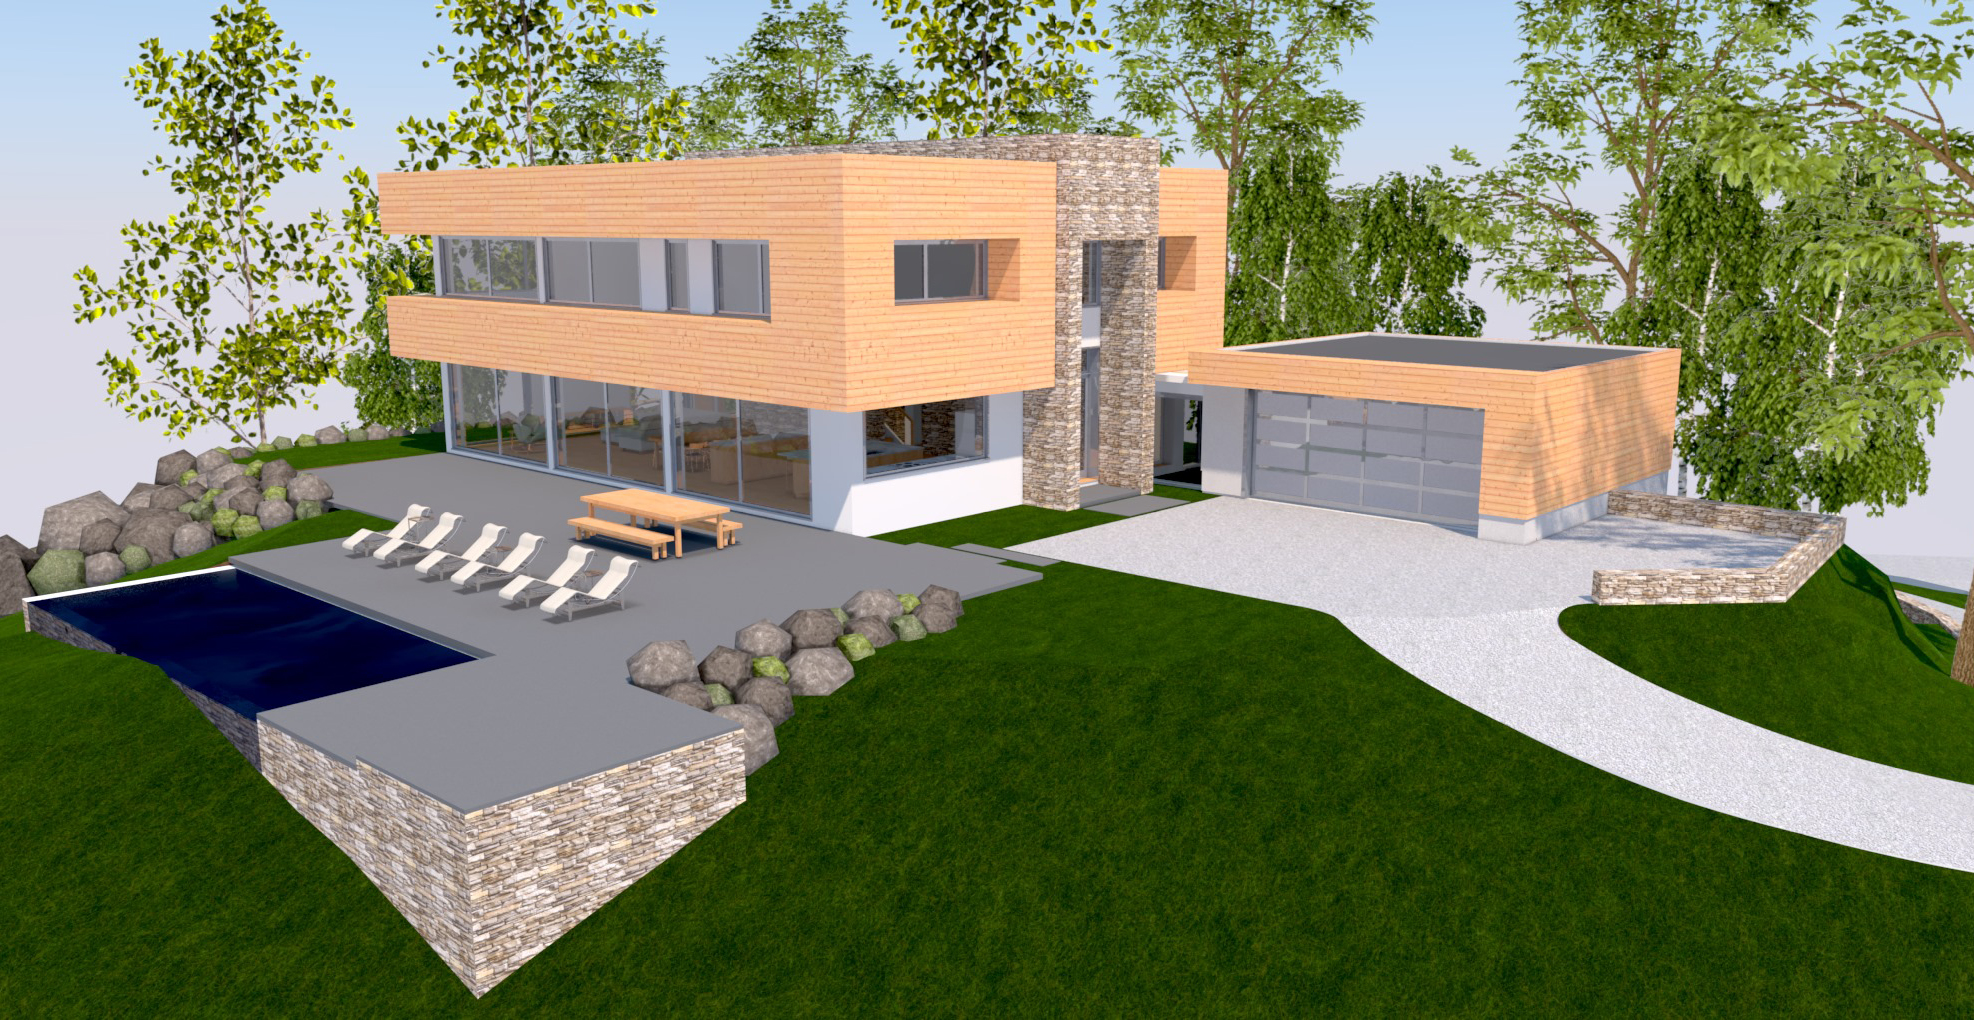 3-phases_design_tan-ledge-southeast.jpg